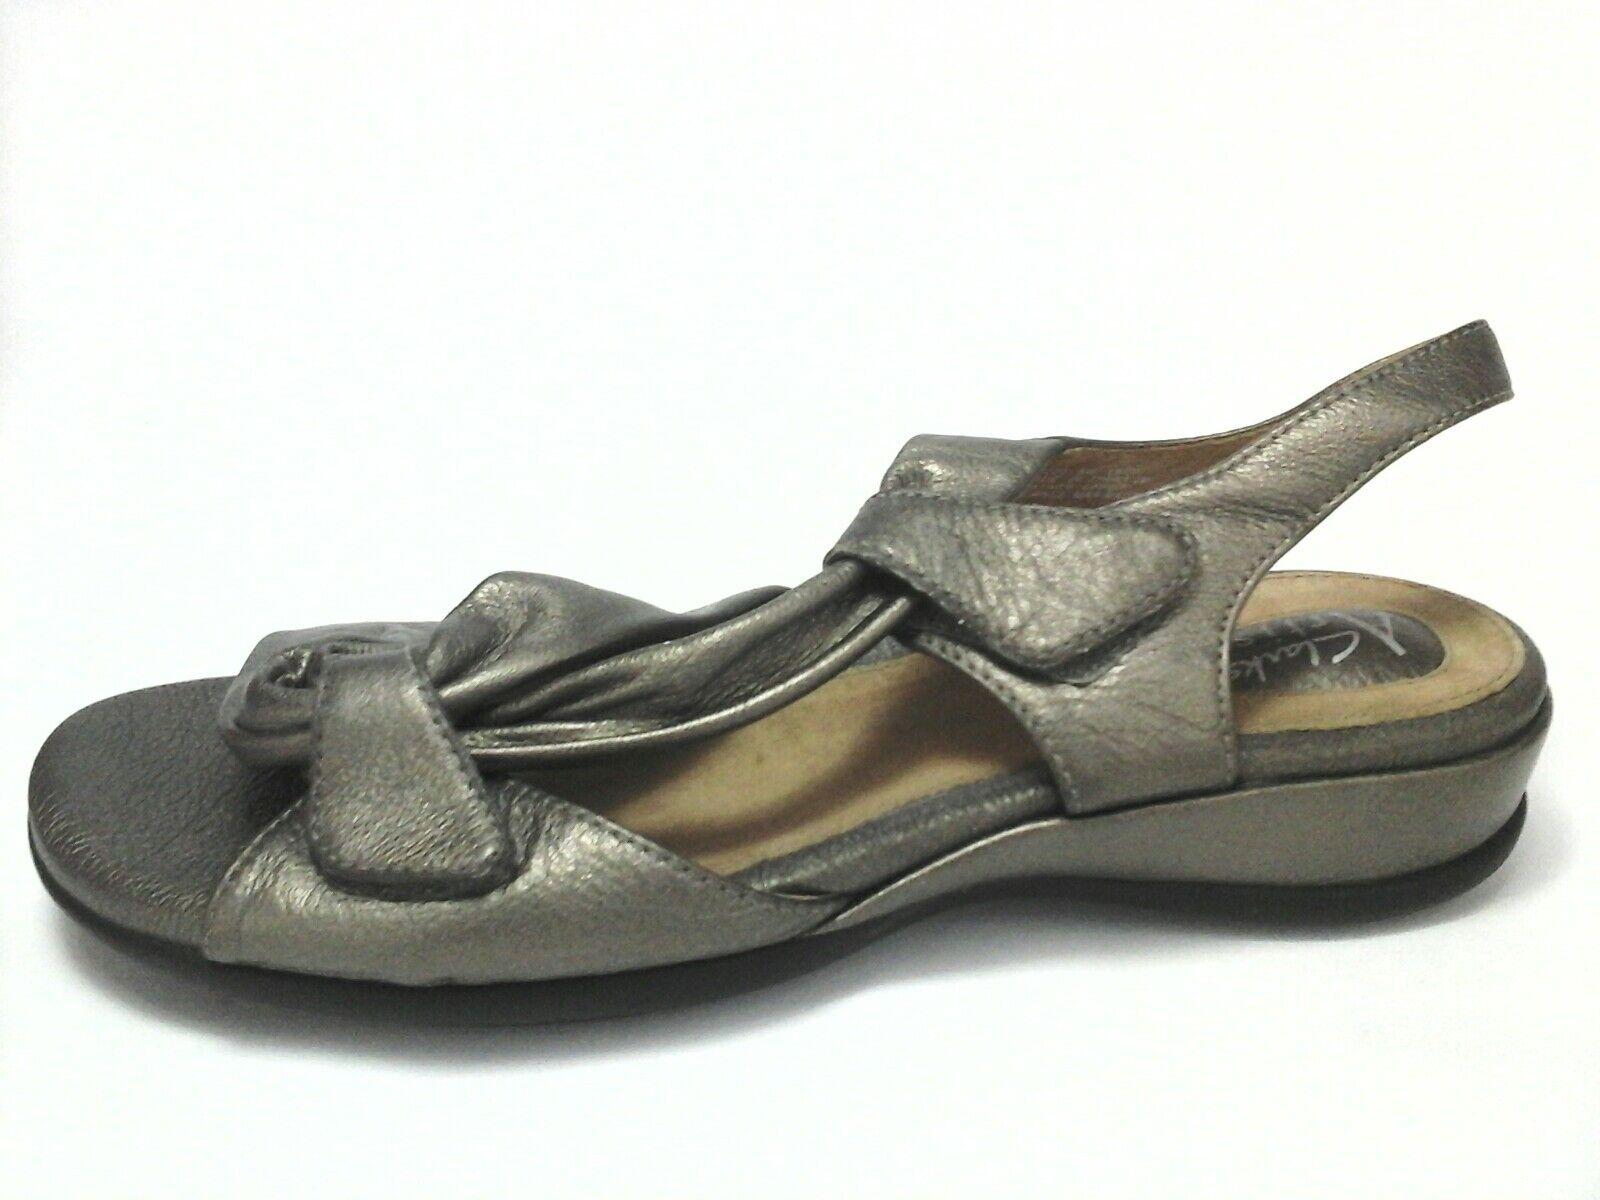 CLARK'S ARTISAN Comfort Schuhes SANDALS Strappy Bronze Leder Schuhes Comfort Damenschuhe US 8 /39 85 7a3474